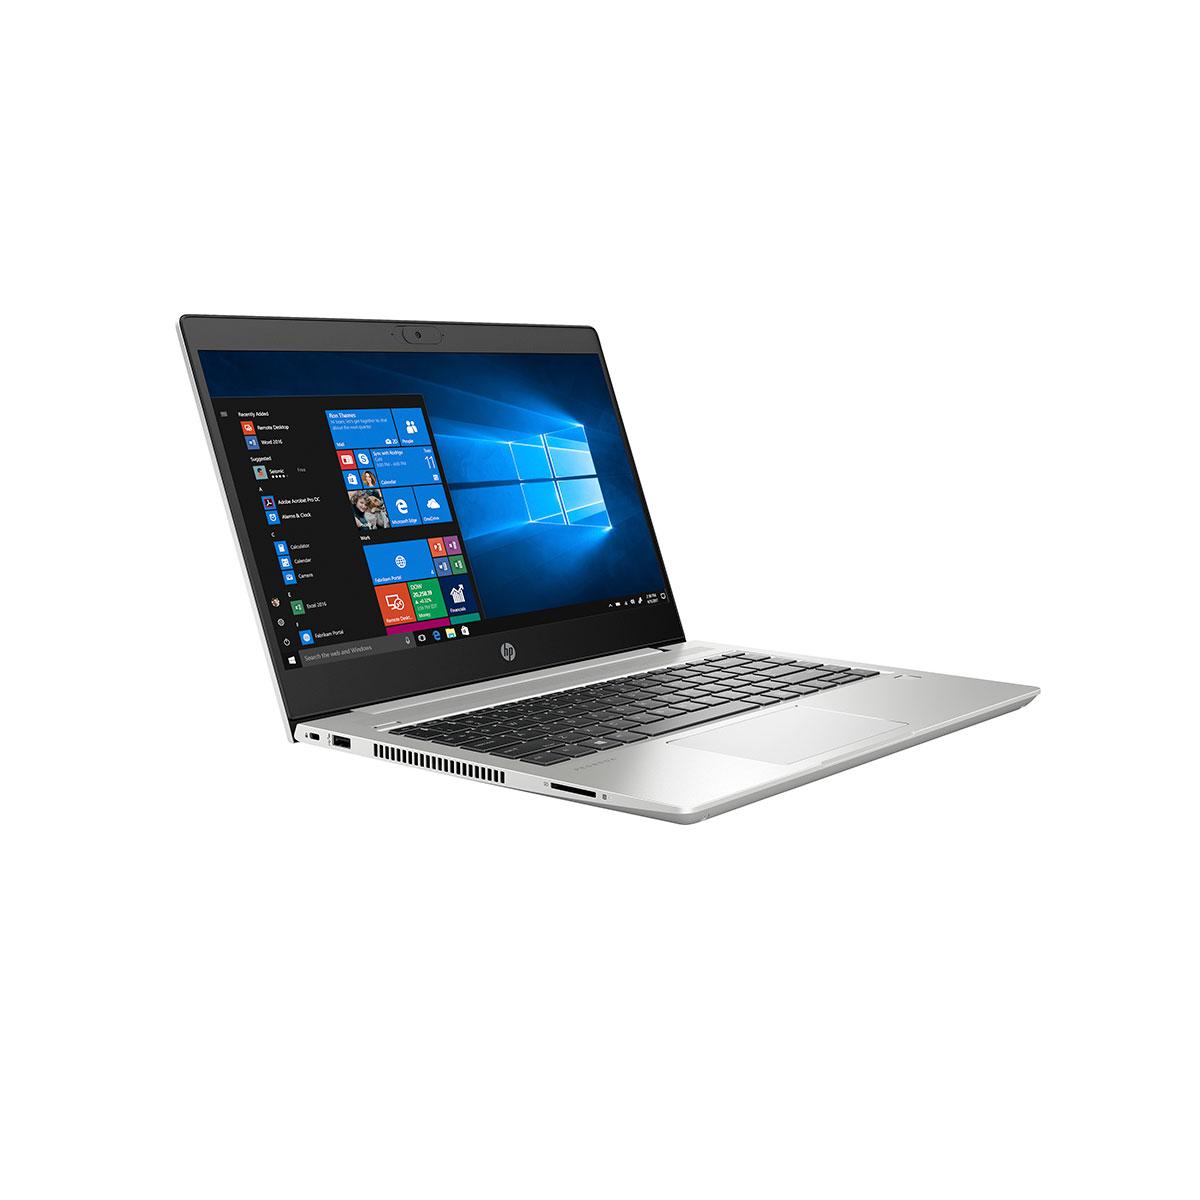 Laptop HP ProBook 450 G7 8YT08LTABM